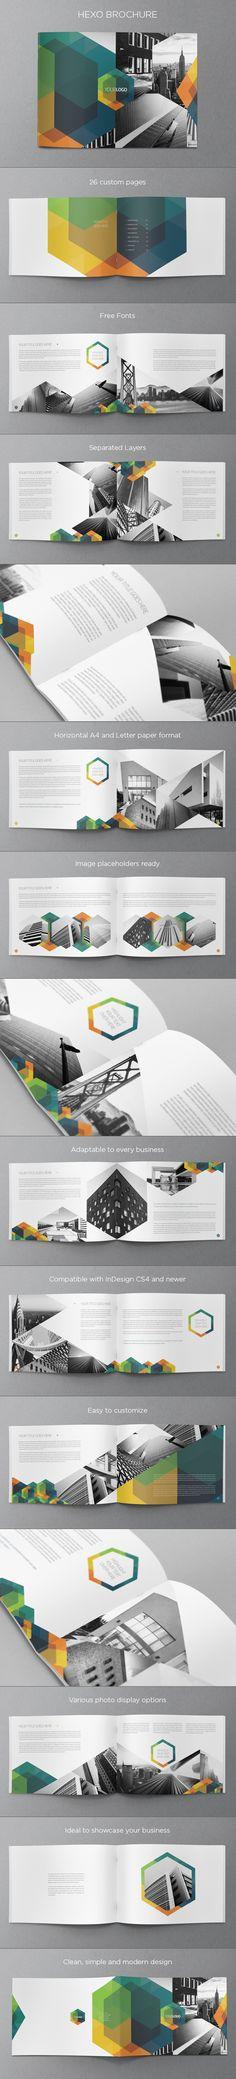 Real Estate Hexo Brochure. Download here: http://graphicriver.net/item/modern-real-estate-hexo-brochure/ #design #brochure